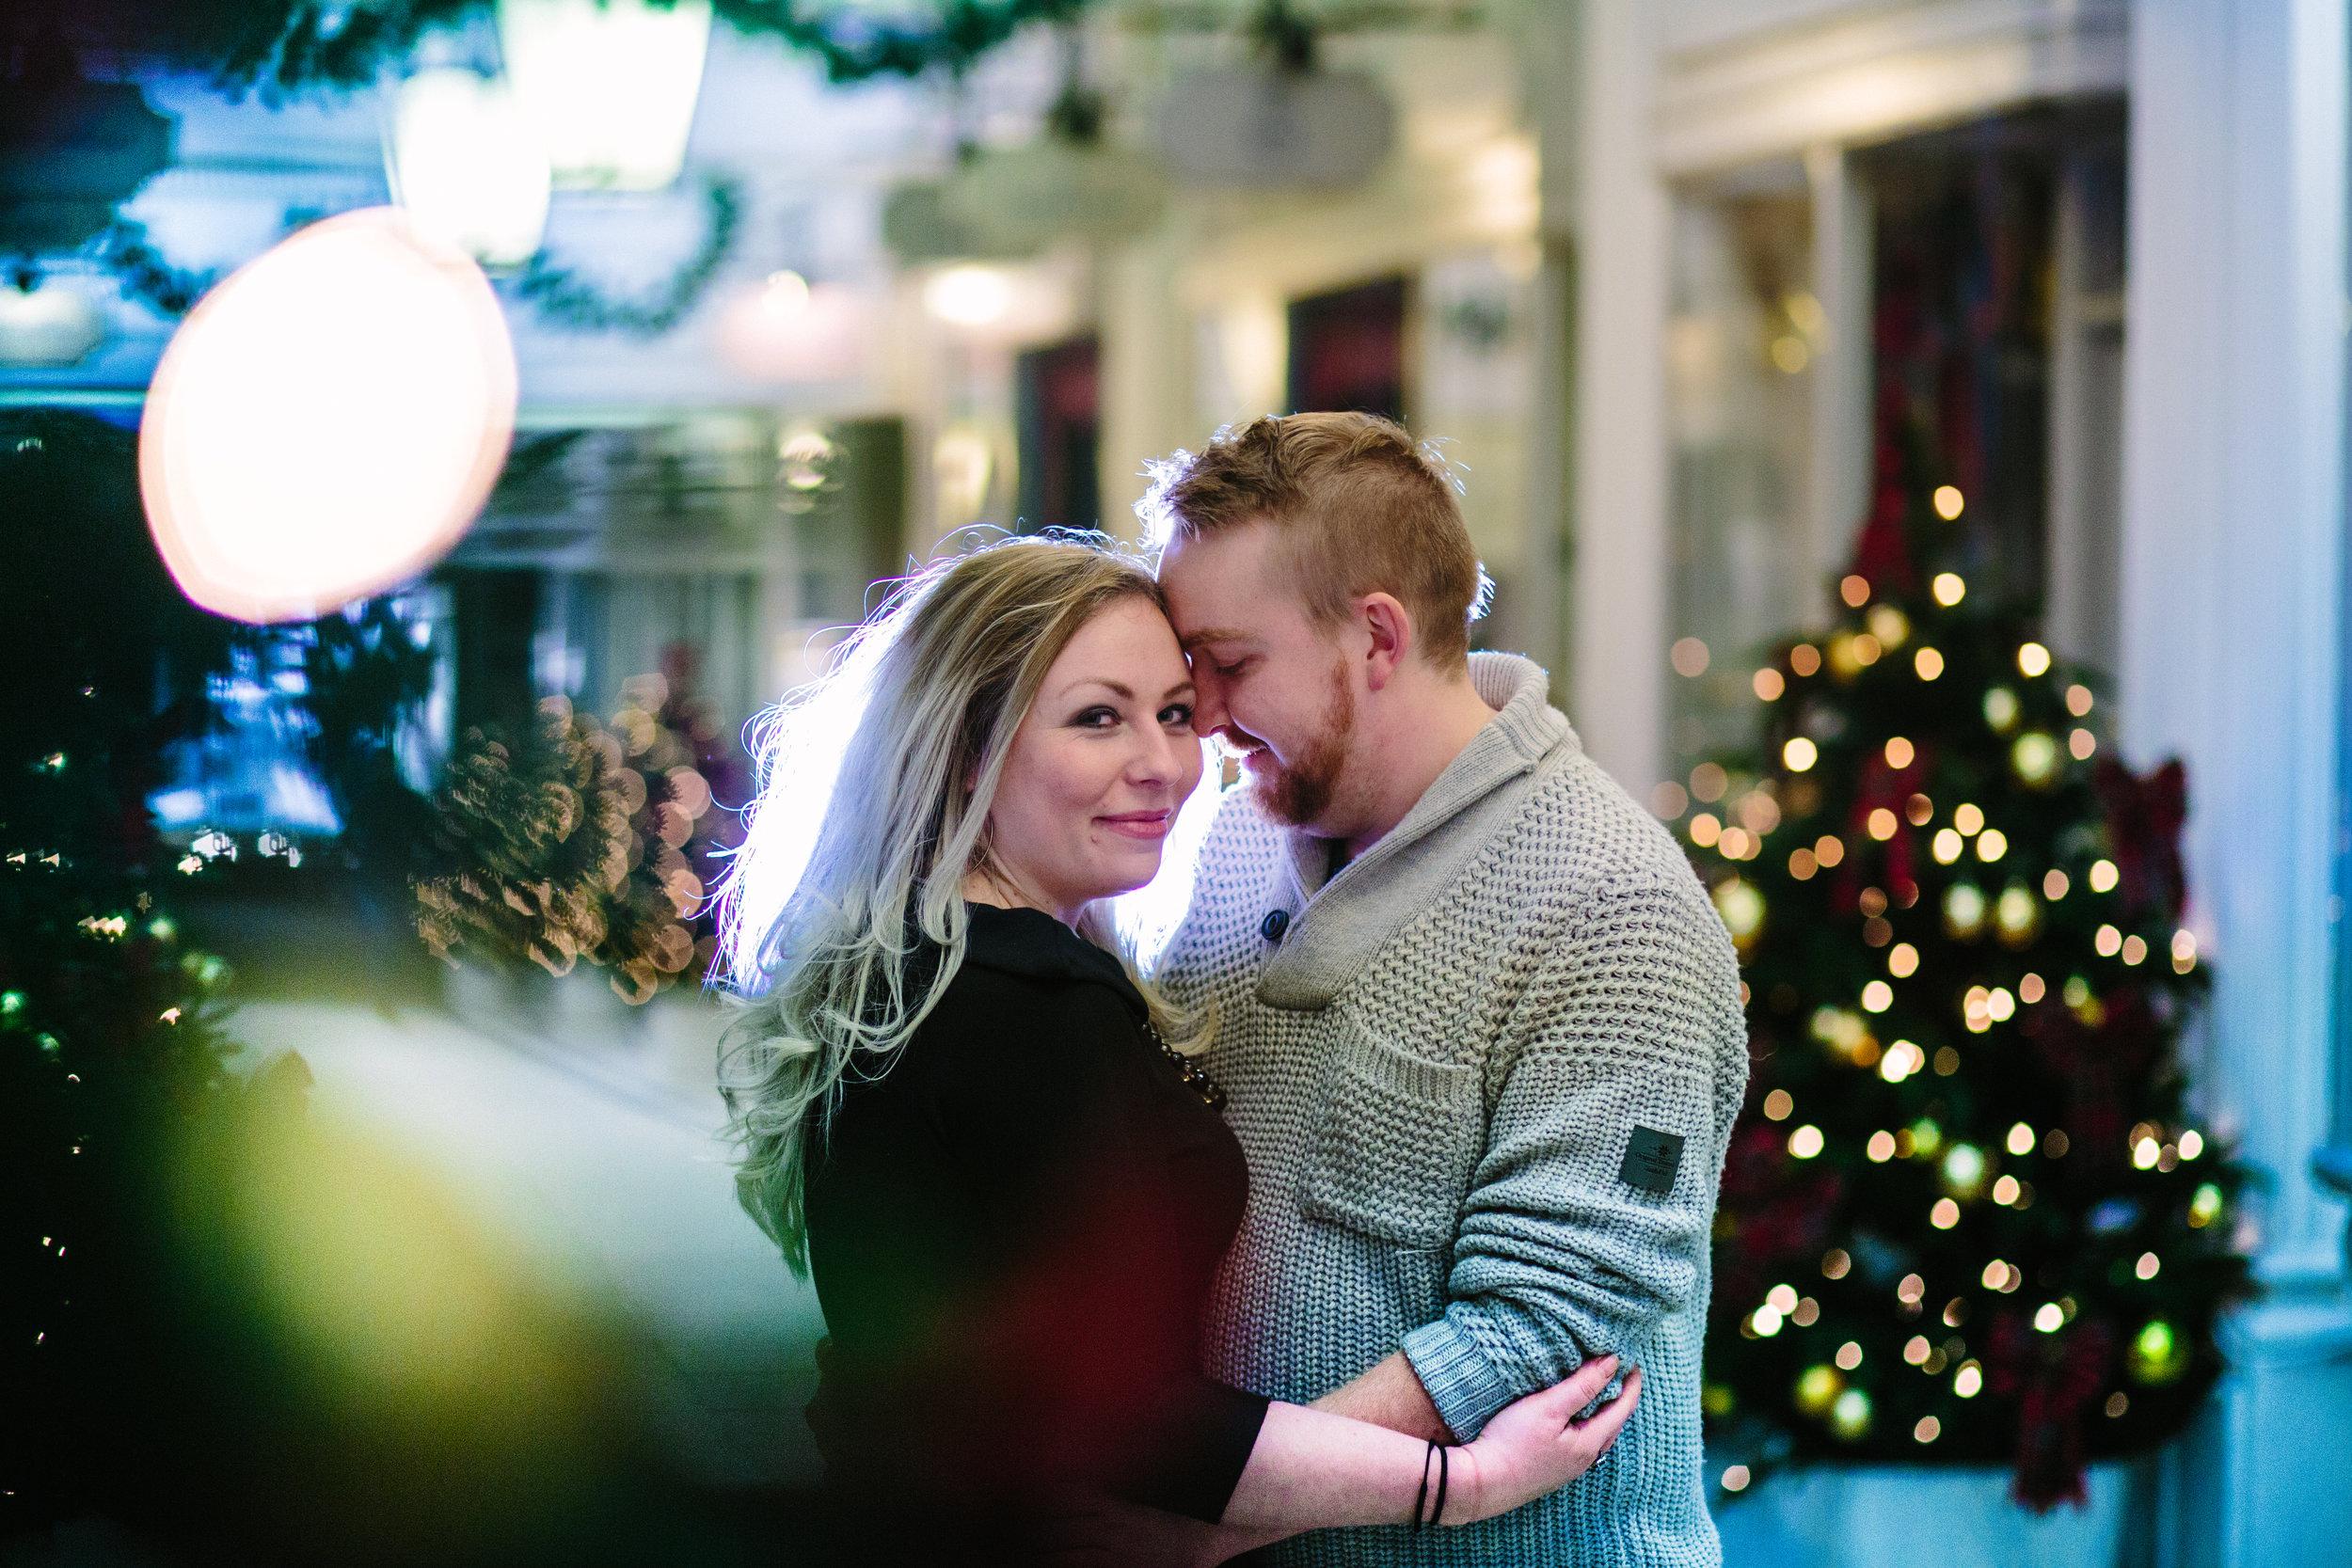 london-oxford-street-christmas-lights-engagement-wedding-photography-11